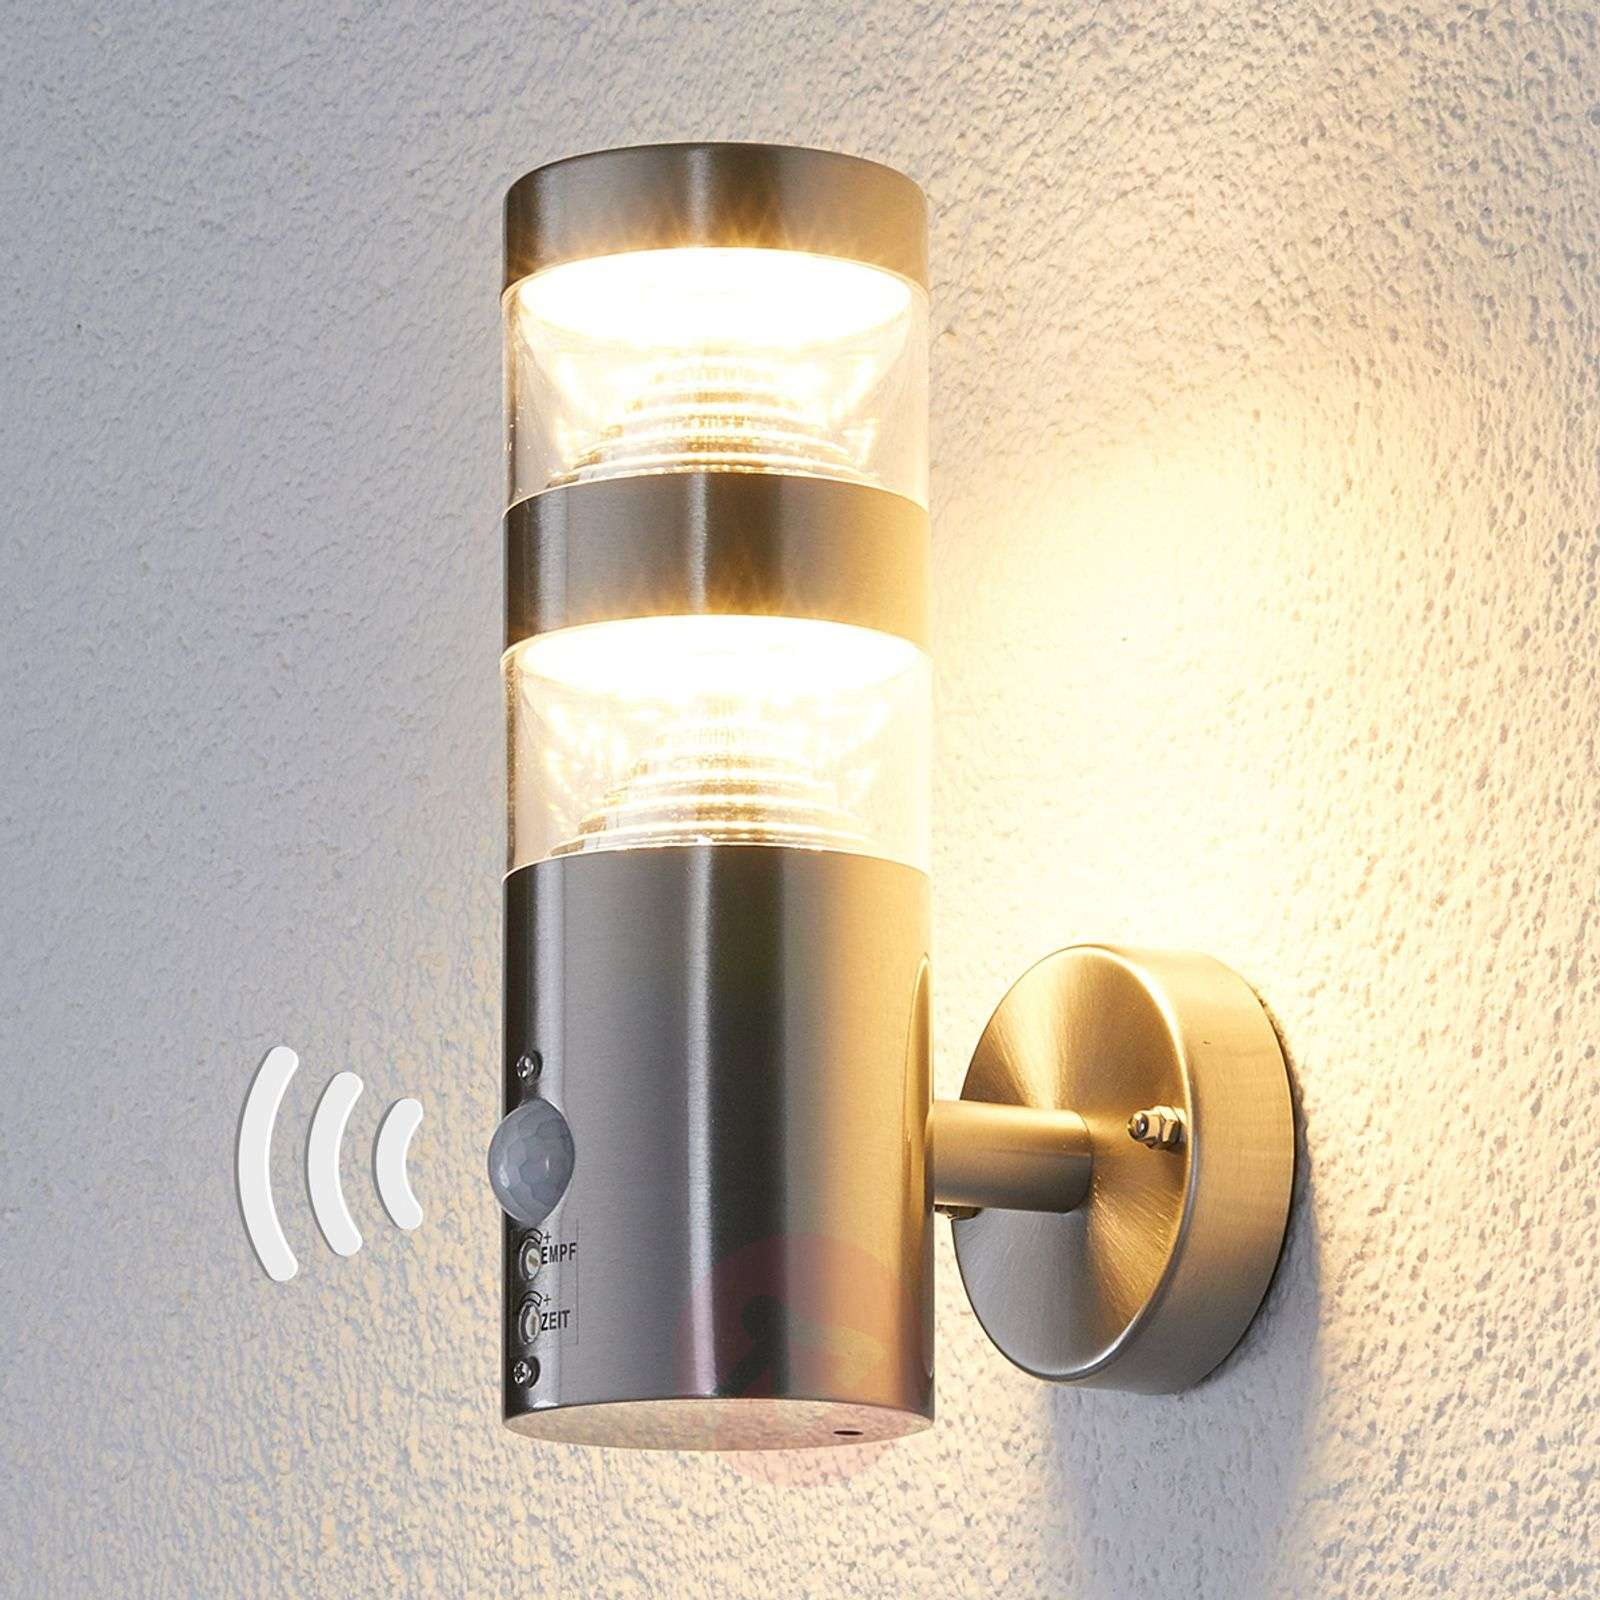 finest selection 6bef2 71cb1 Lanea LED outdoor wall light, straight, sensor